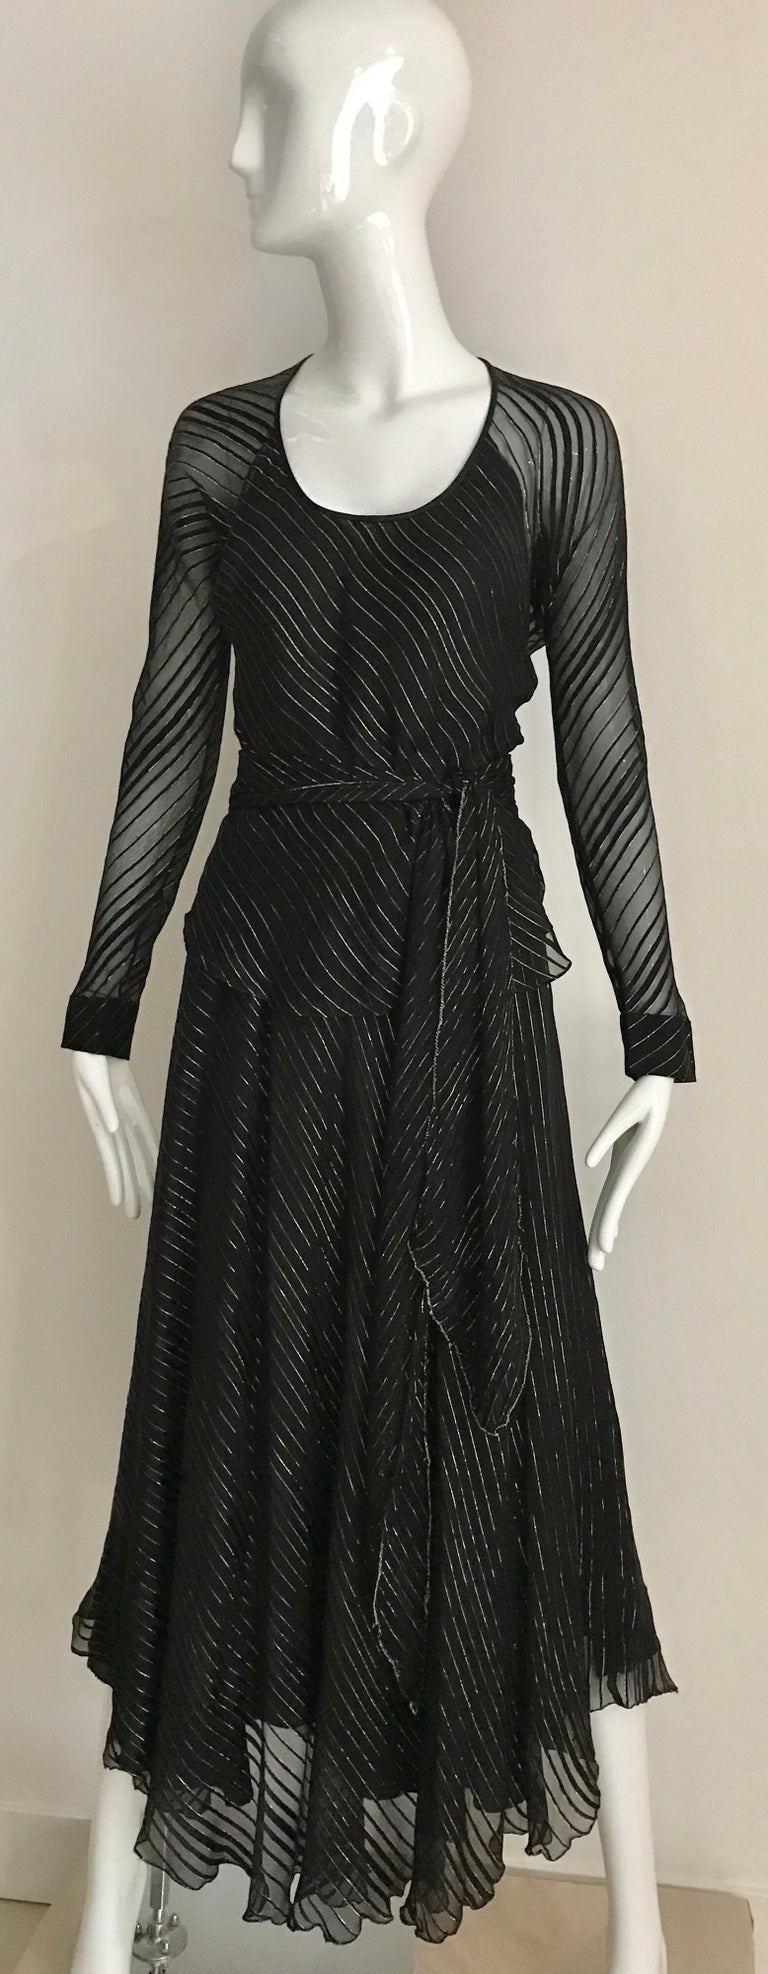 Vintage Julio Black and Gild Silk Blouse and Skirt Set  For Sale 7